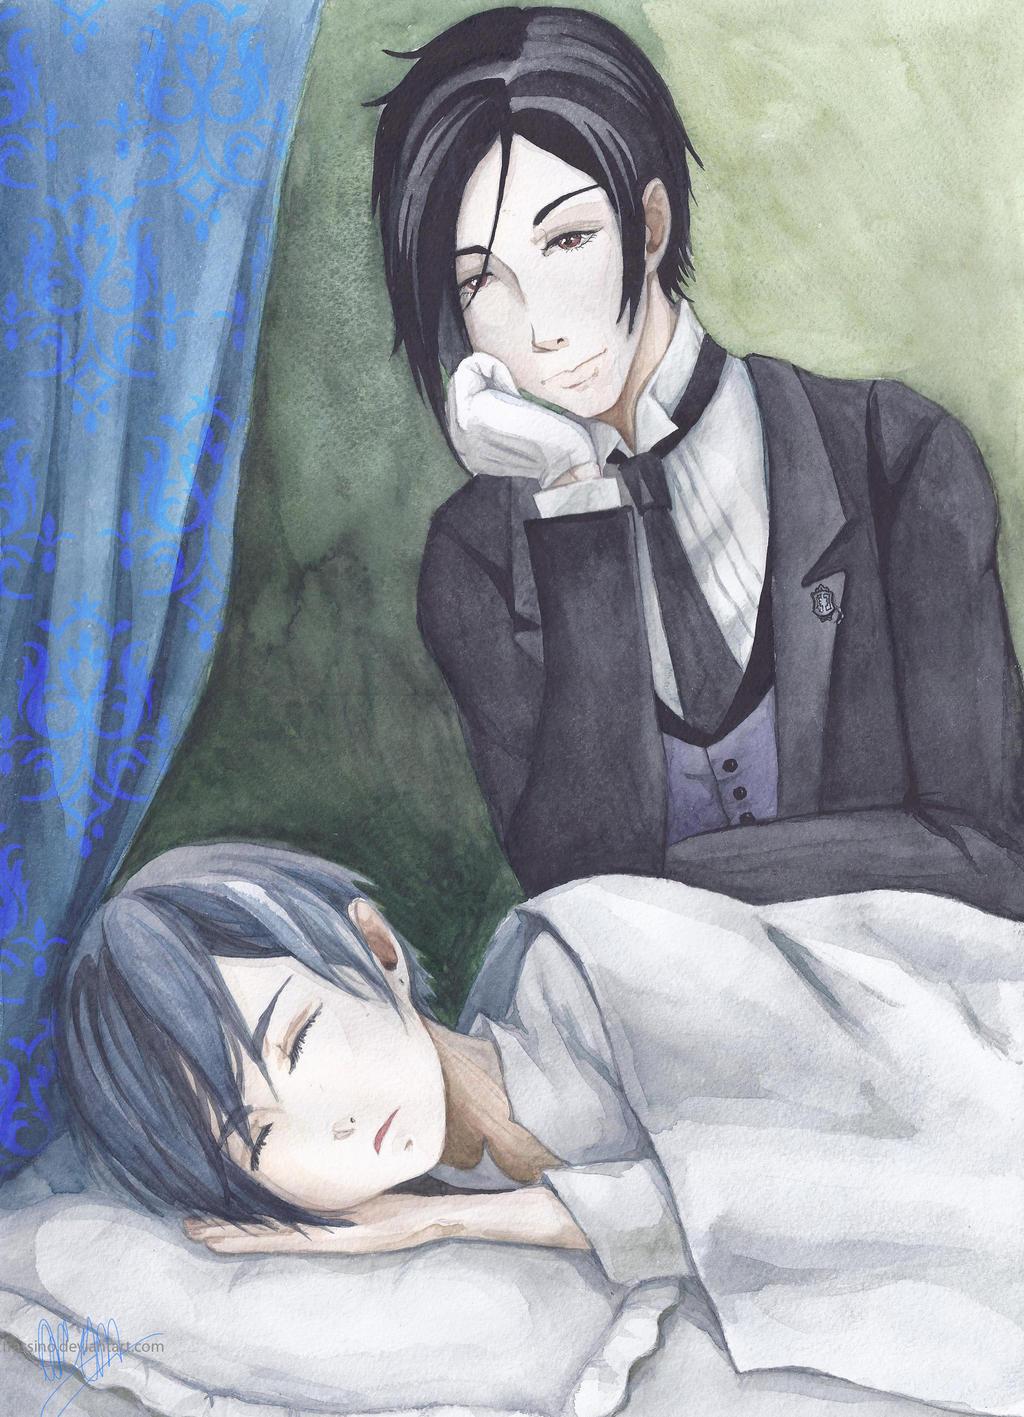 Sebastian and sleeping Ciel by frassino